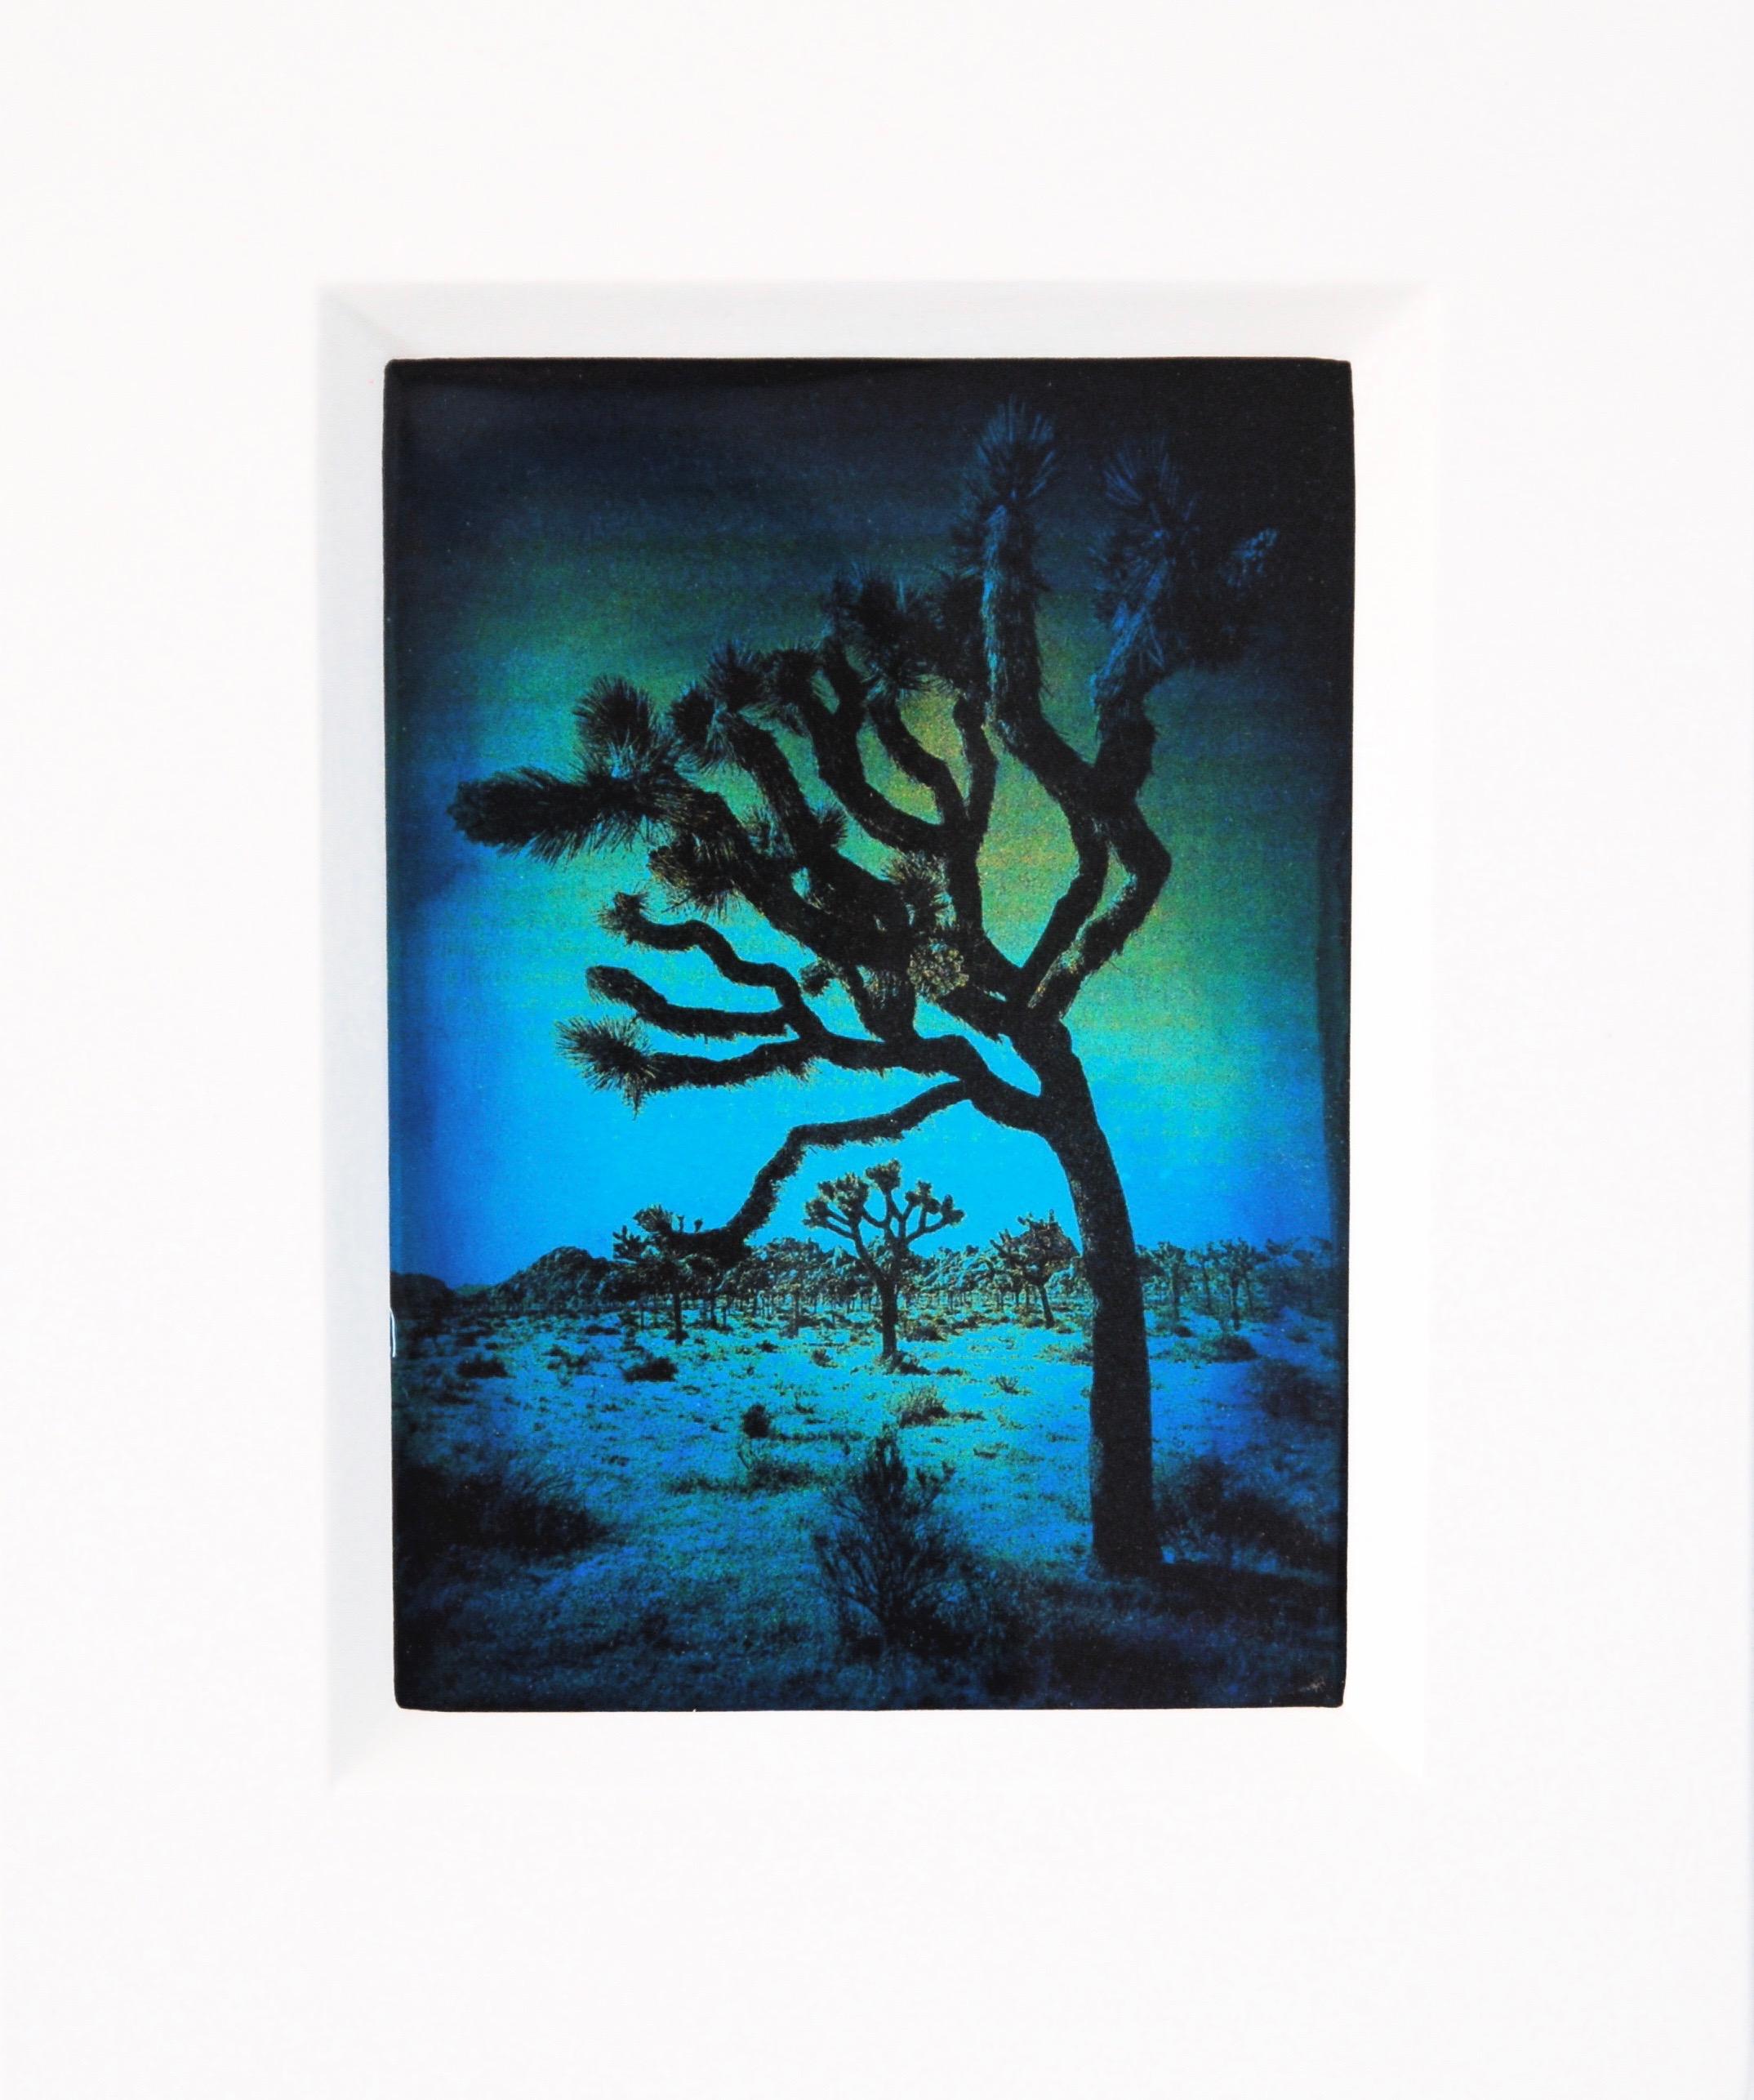 "Julia King - Blue Joshua Tree, 10 1/2""h x 8 3/4""w x 1 3/4""d, photography based 3-d mixed media, resin, pigment, handmade wood frame"